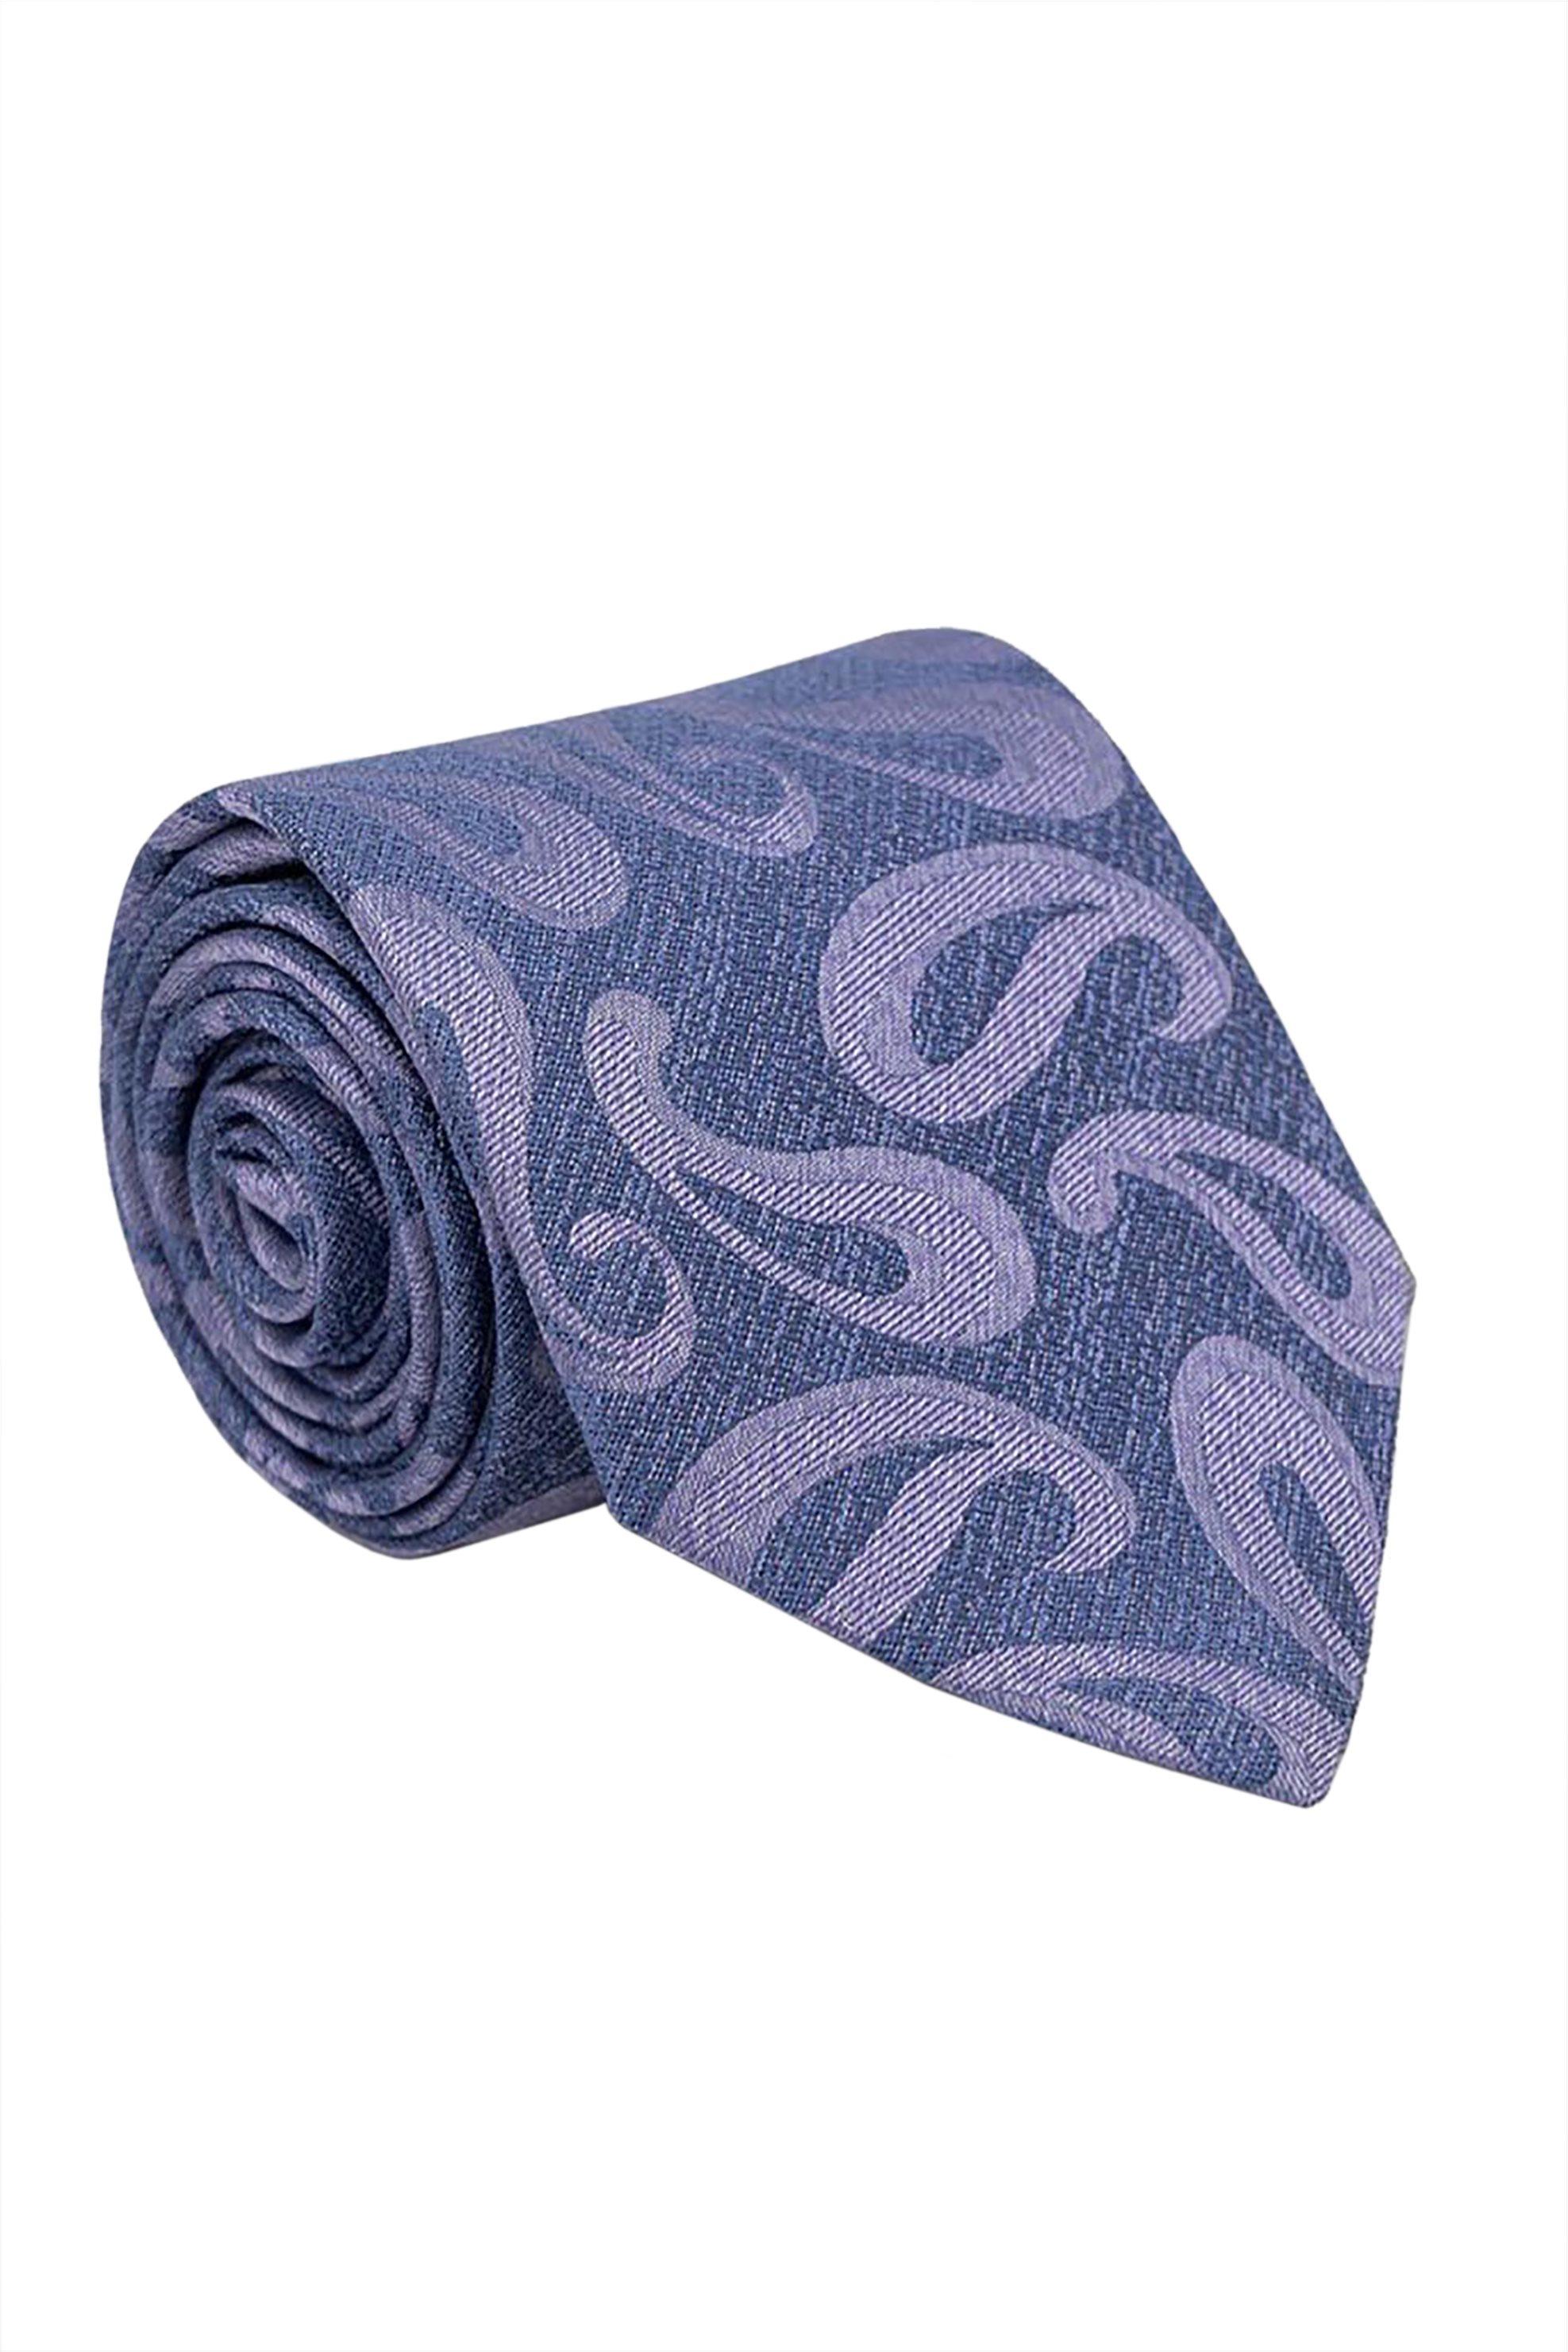 Oxford Company ανδρική μεταξωτή γραβάτα με all-over print - TIE51-414.02 - Μπλε